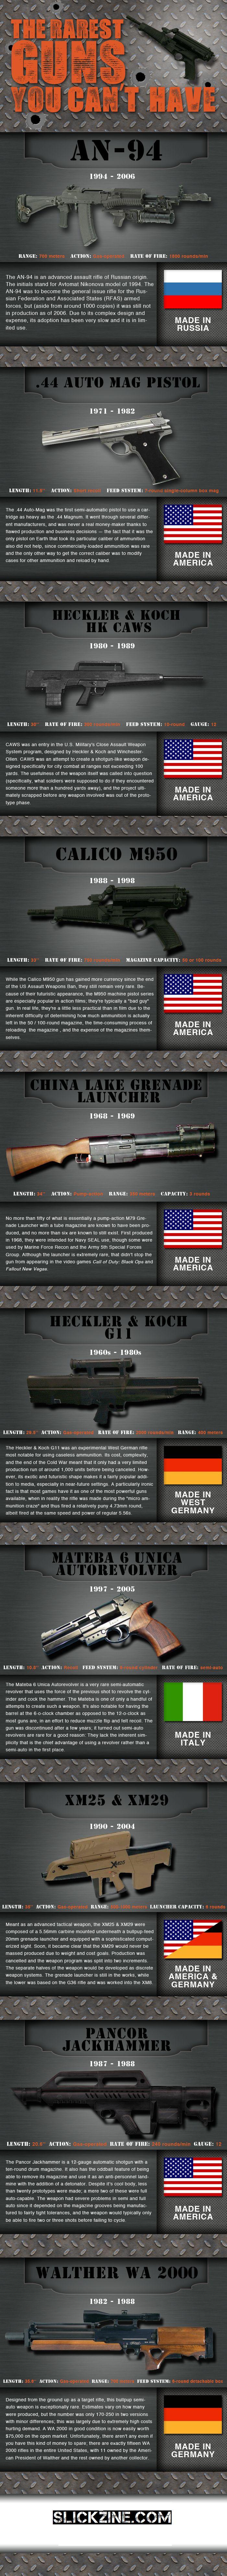 Rarest Guns and Rifles from around the world